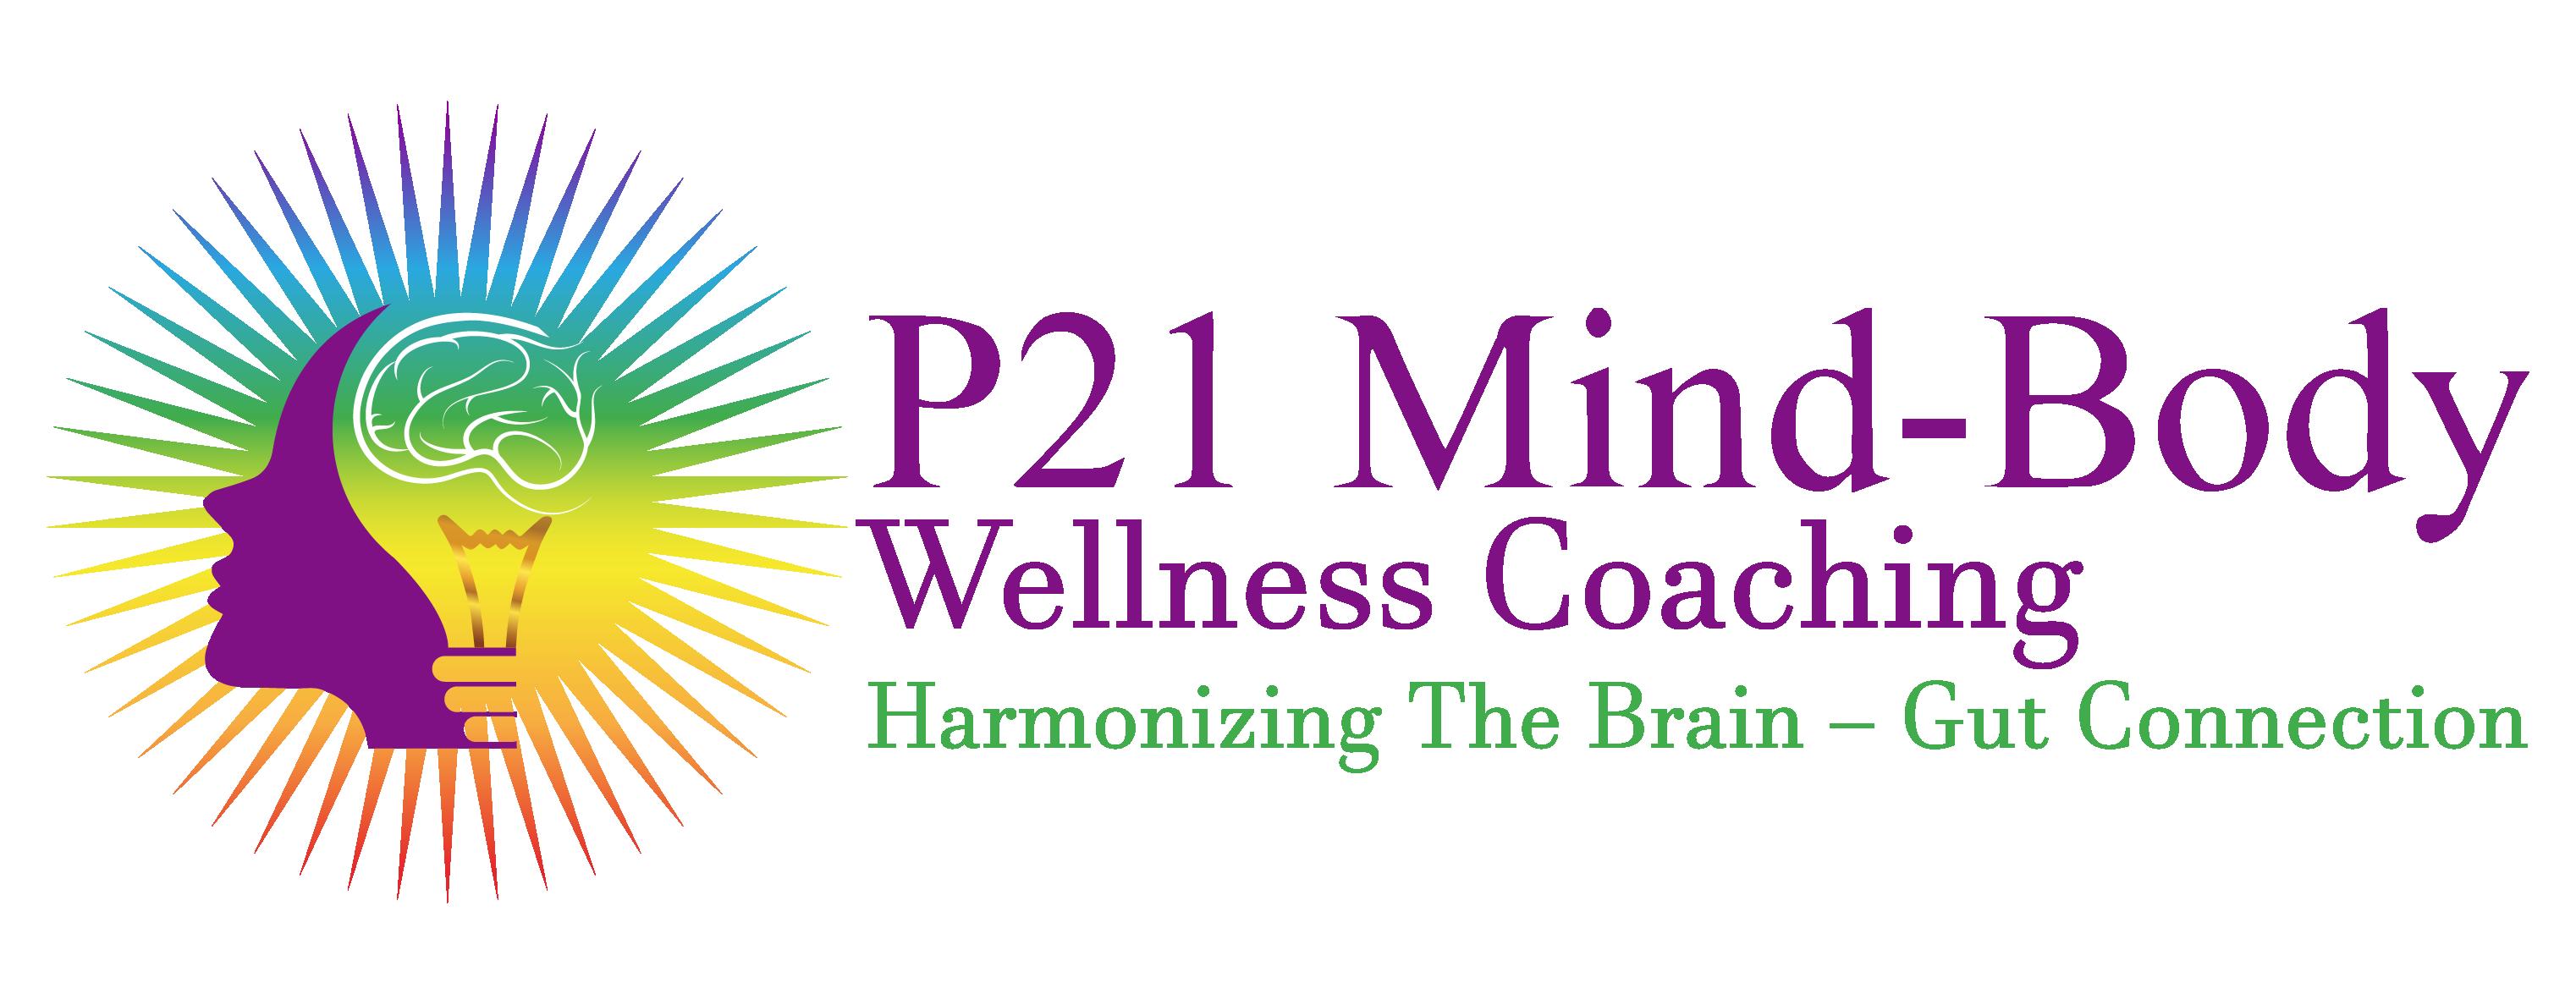 P21 Mind-Body Wellness Coaching